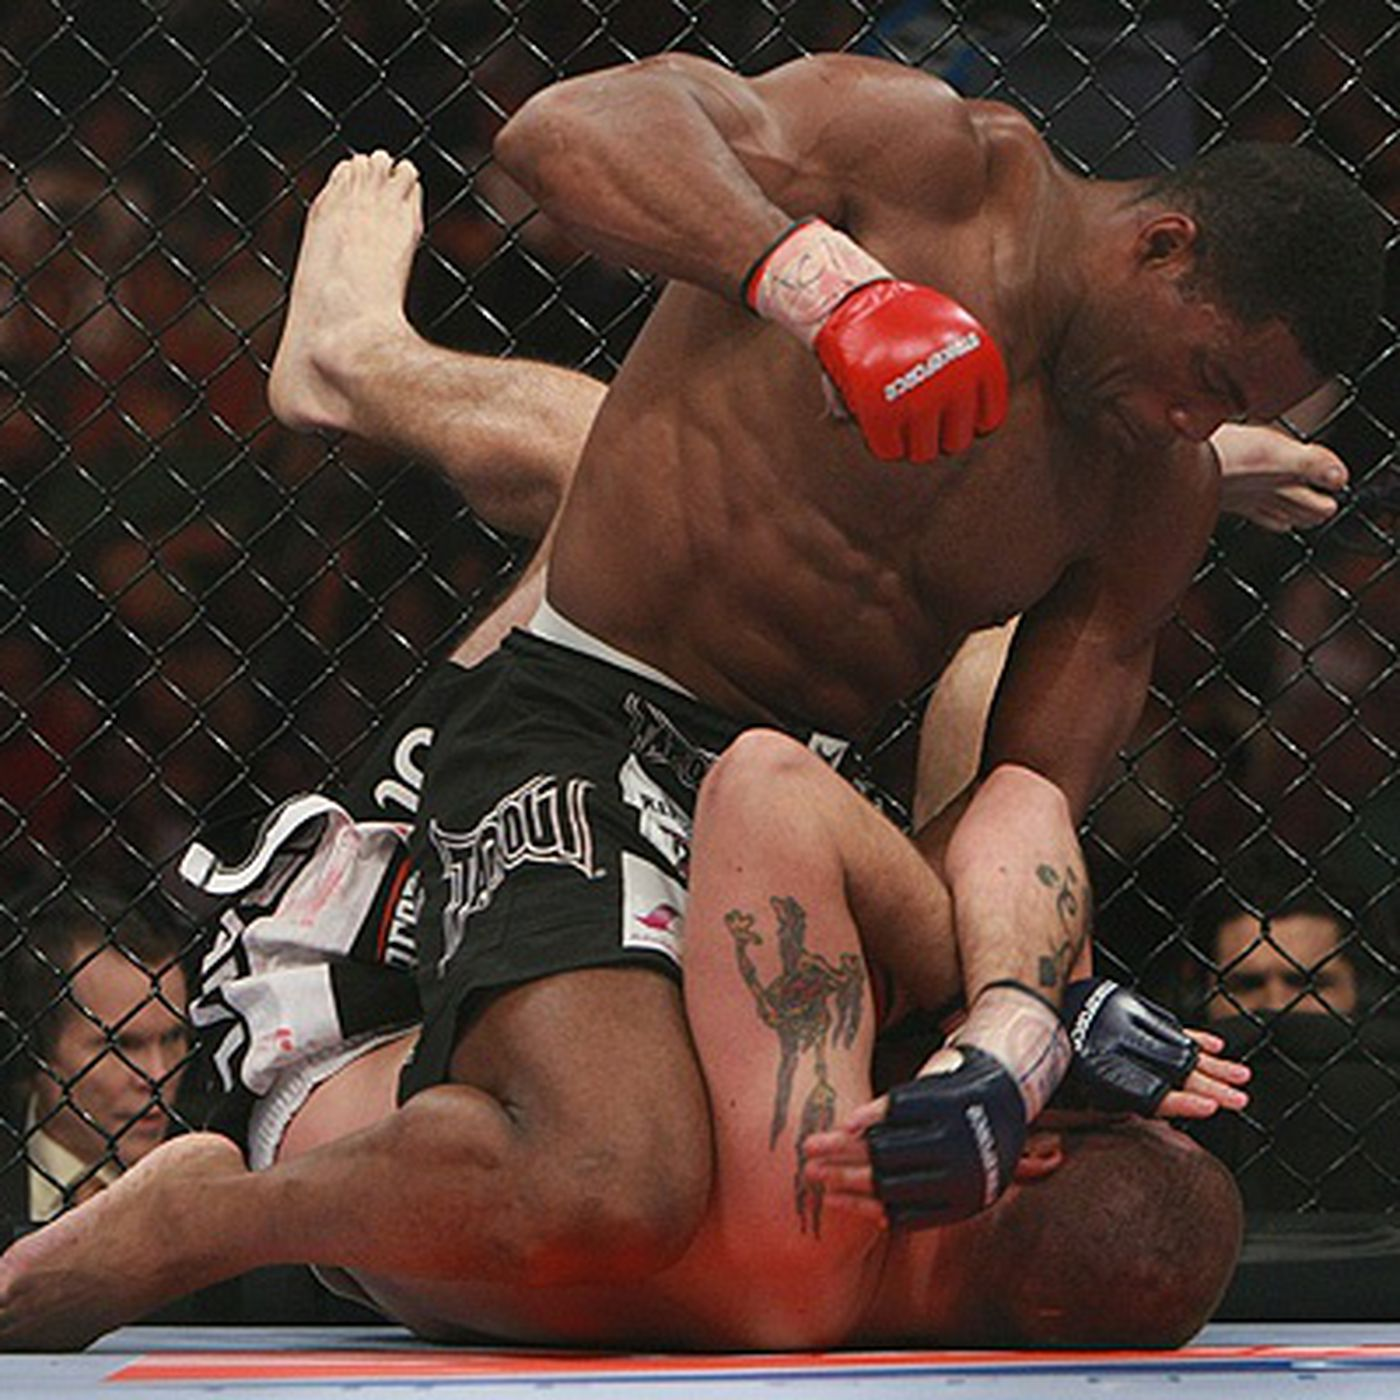 Array av Permeabilitet Troget  Strikeforce Miami Fight by Fight Coverage: Herschel Walker Wins a One-Sided  Fight Over Greg Nagy (